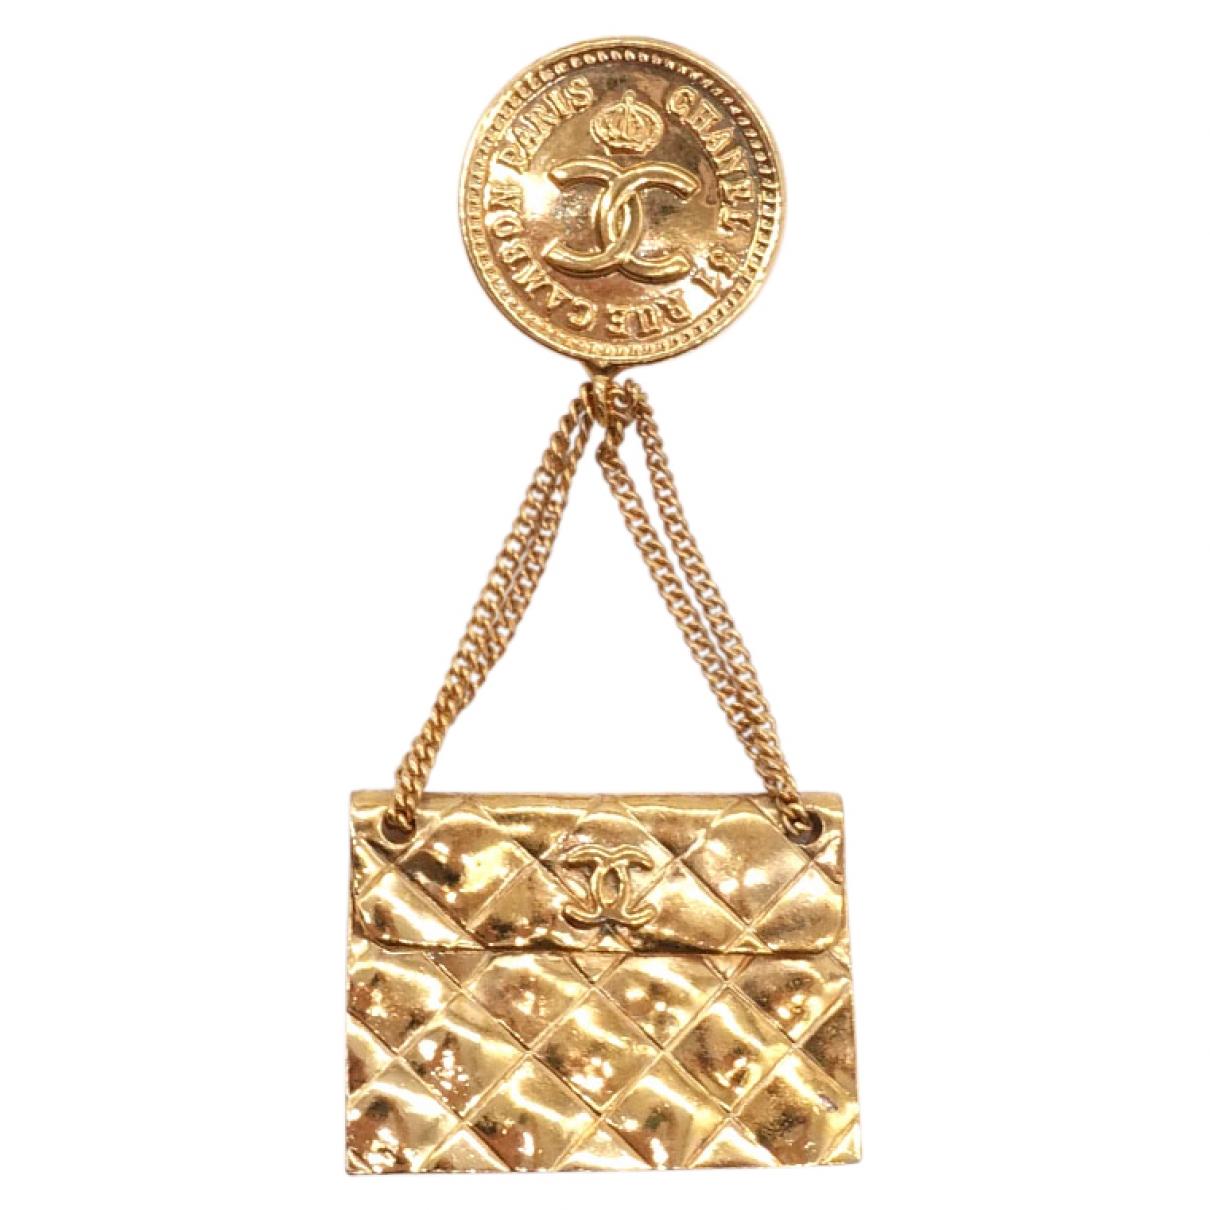 Broche Matelasse en Chapado en oro Dorado Chanel